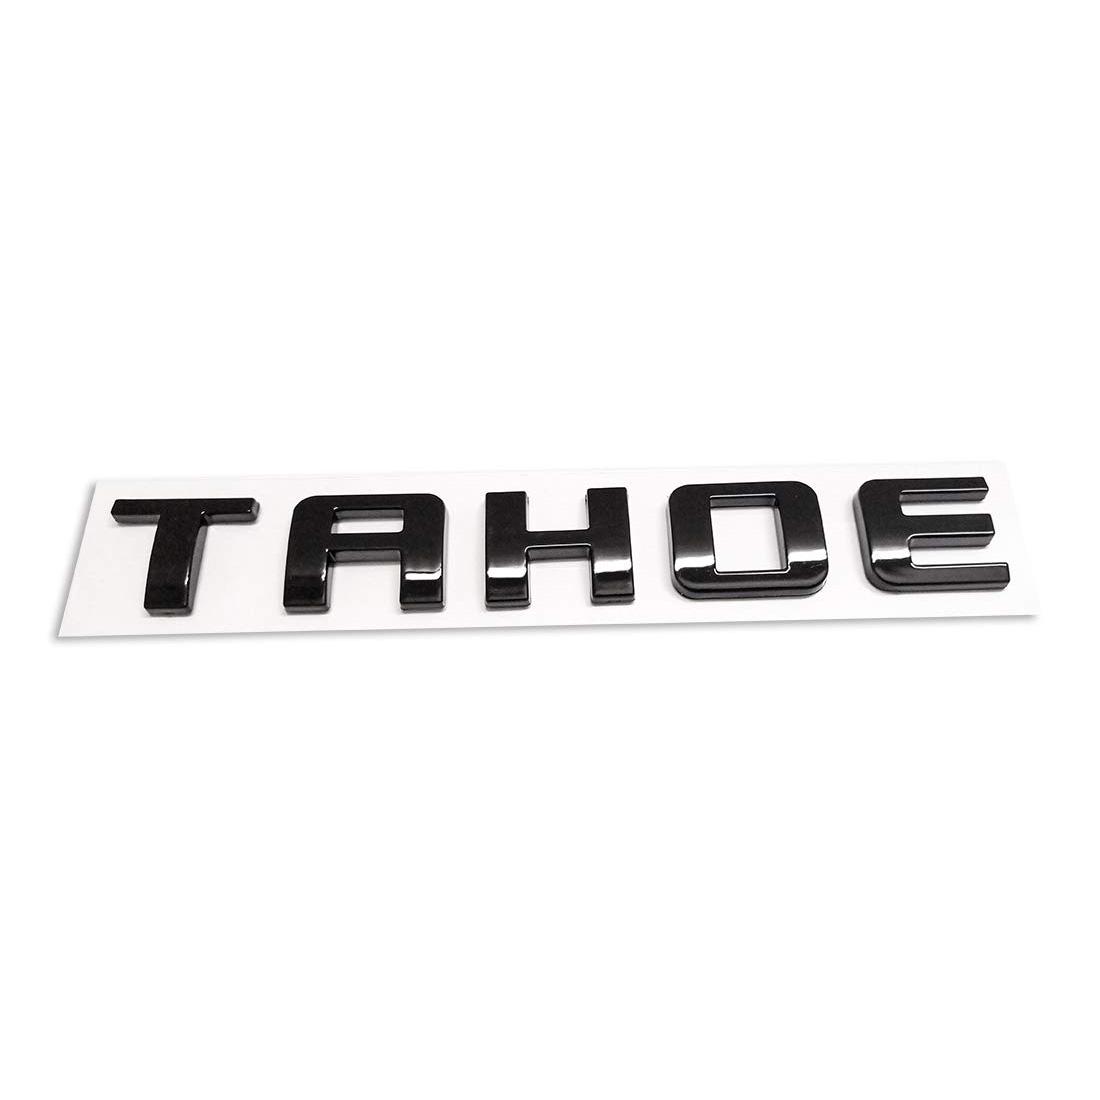 CHEVY TAHOE EMBLEM 07-19 FRONT DOOR//REAR LIFTGATE CHROME BADGE sign symbol logo